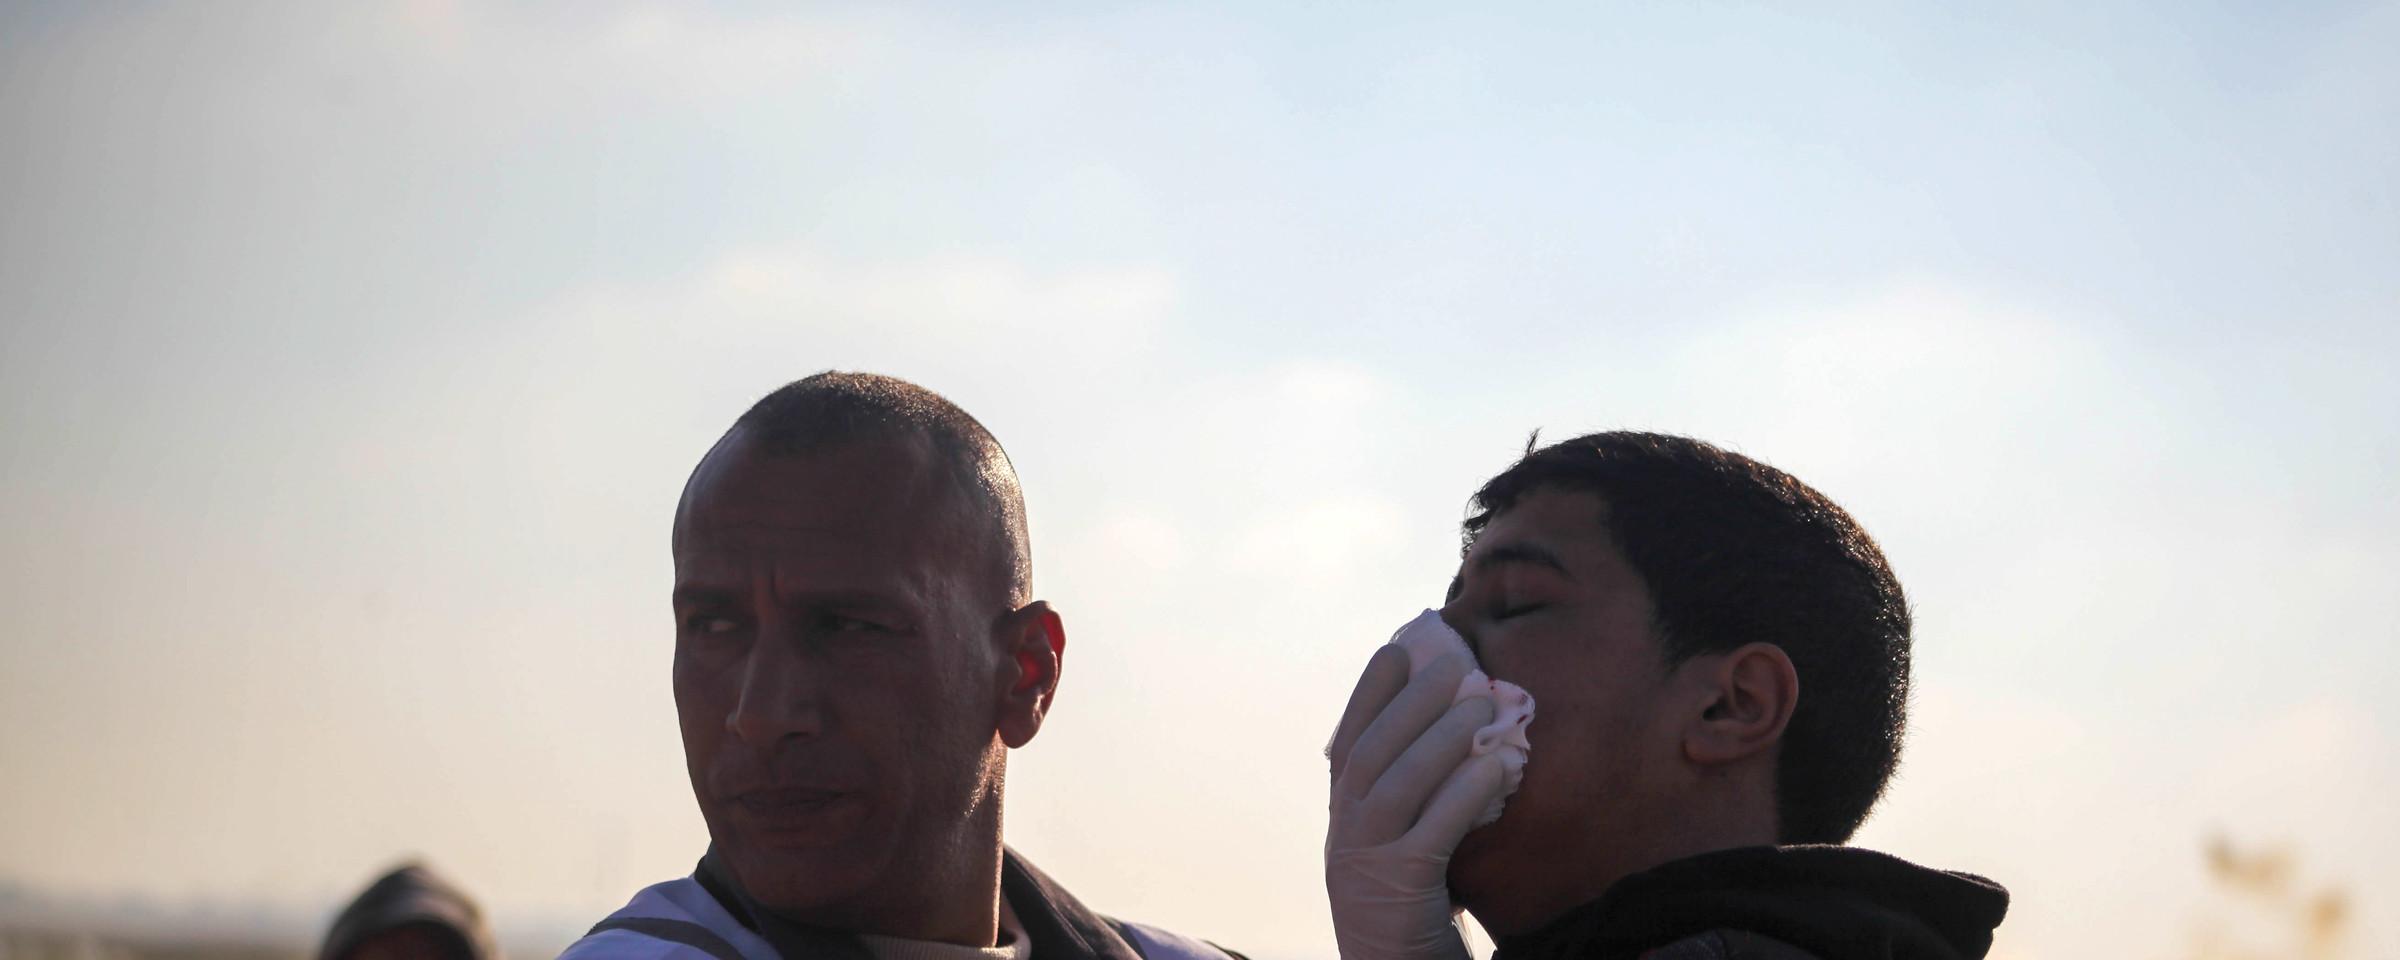 Medic presses gauze against side of man's face